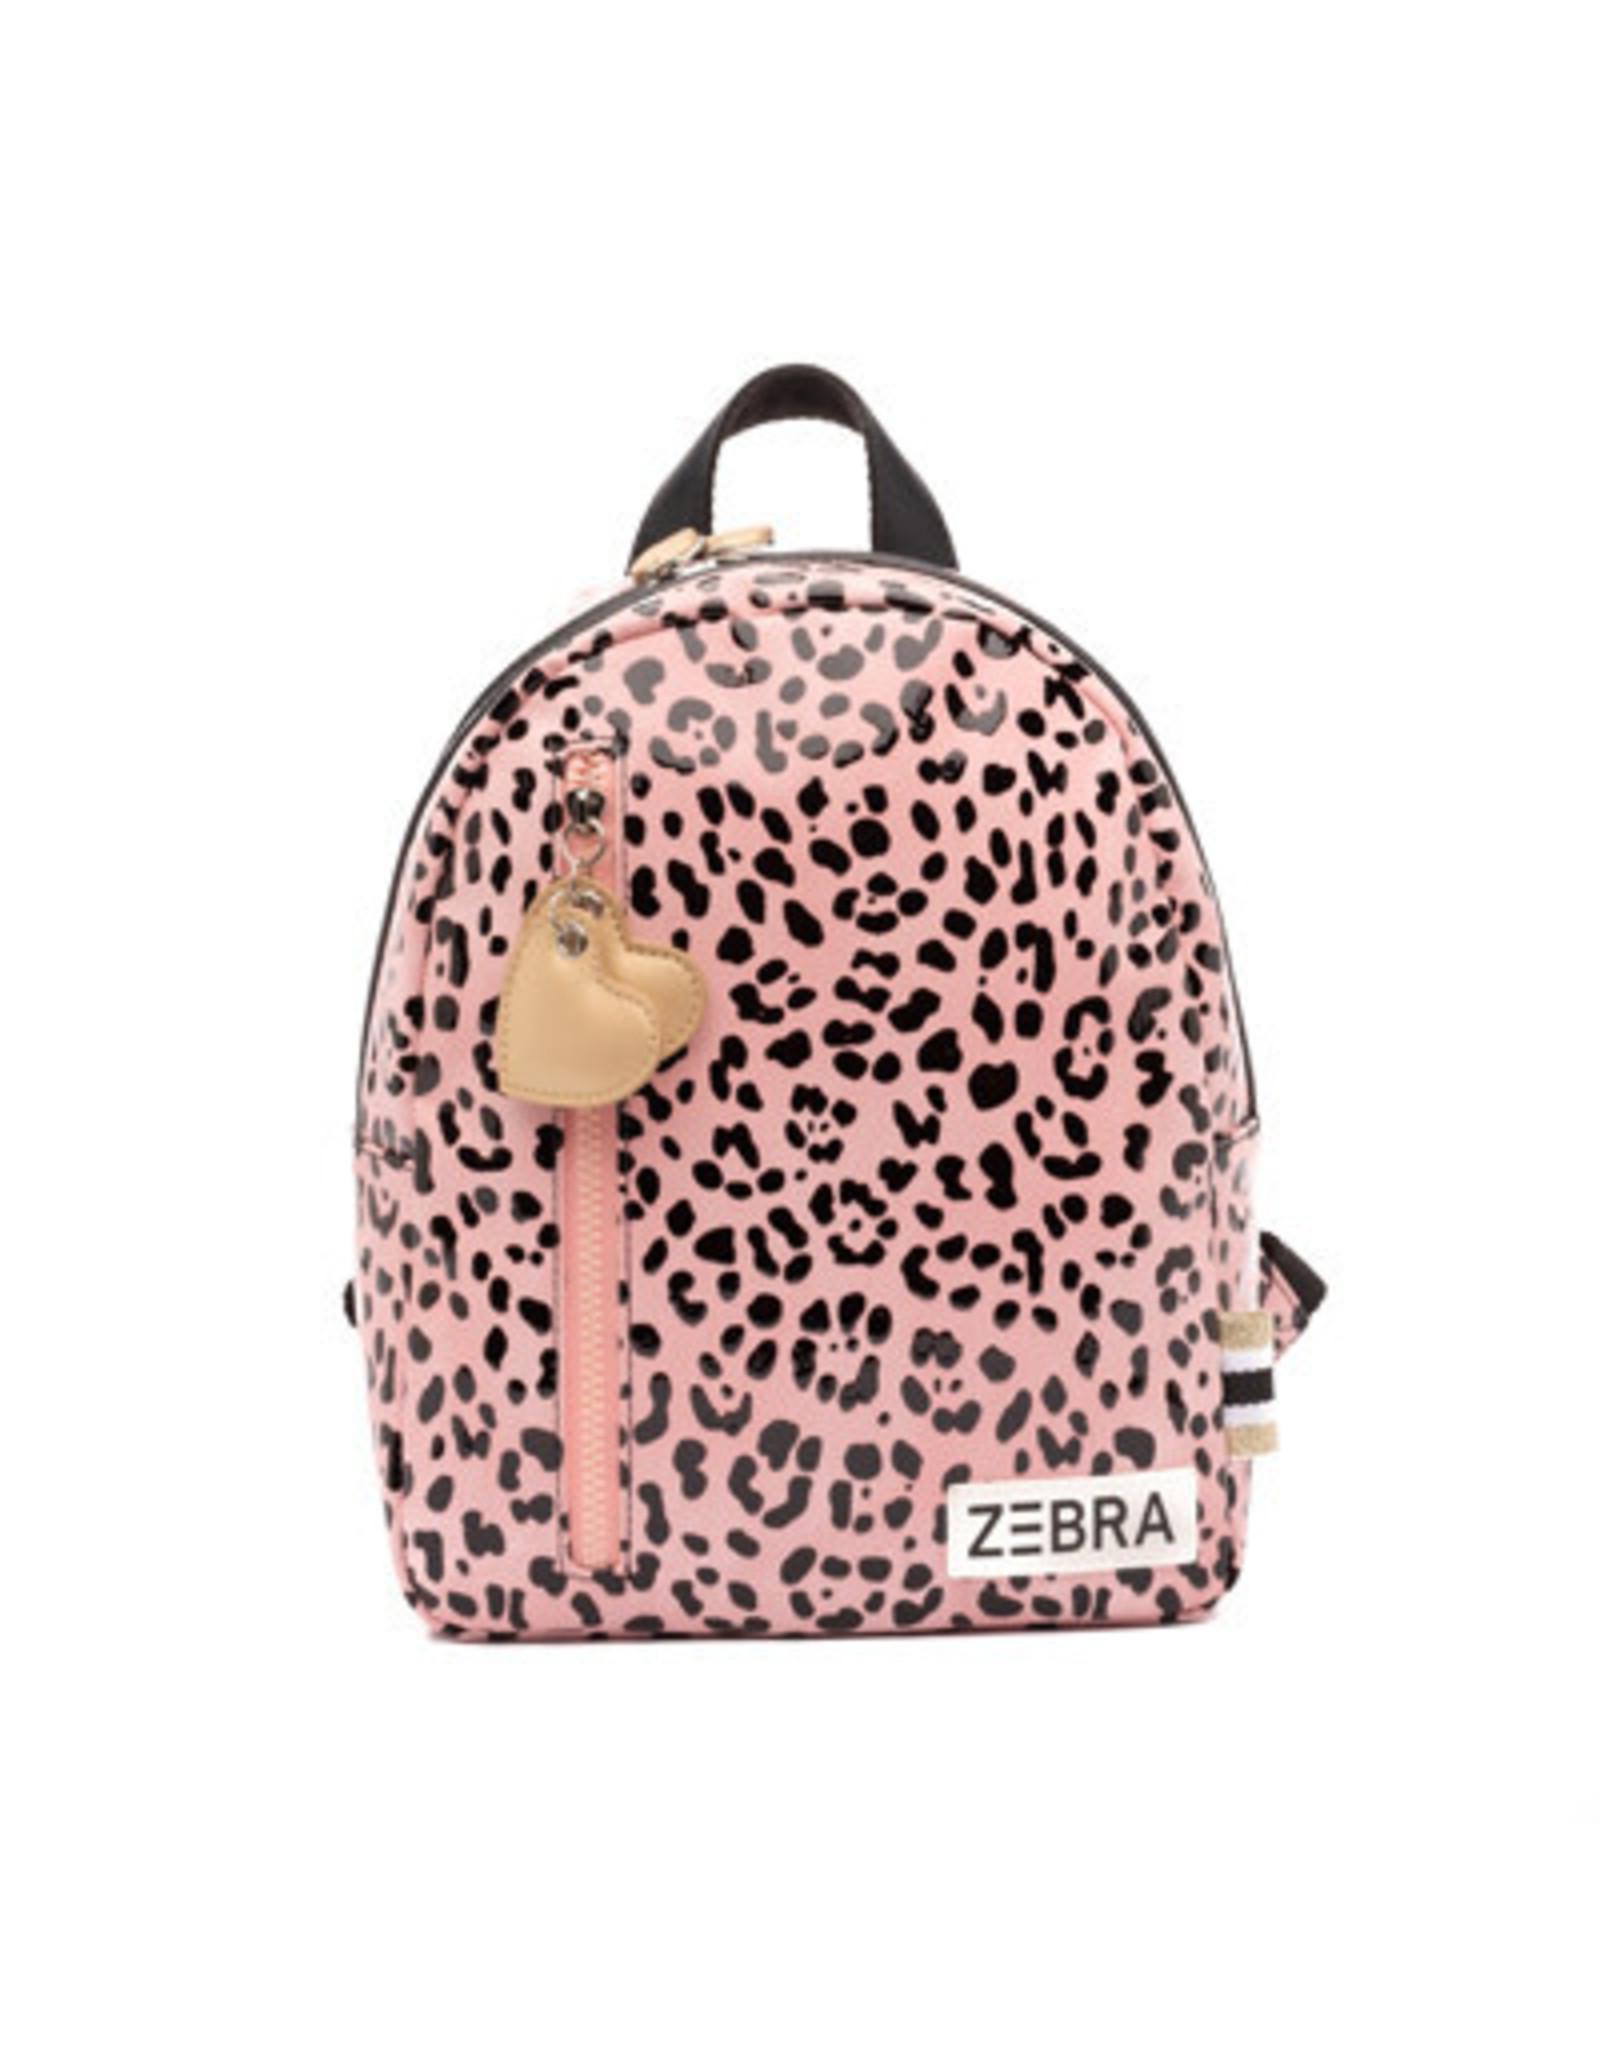 Zebra Rugzak Pink spot maat S